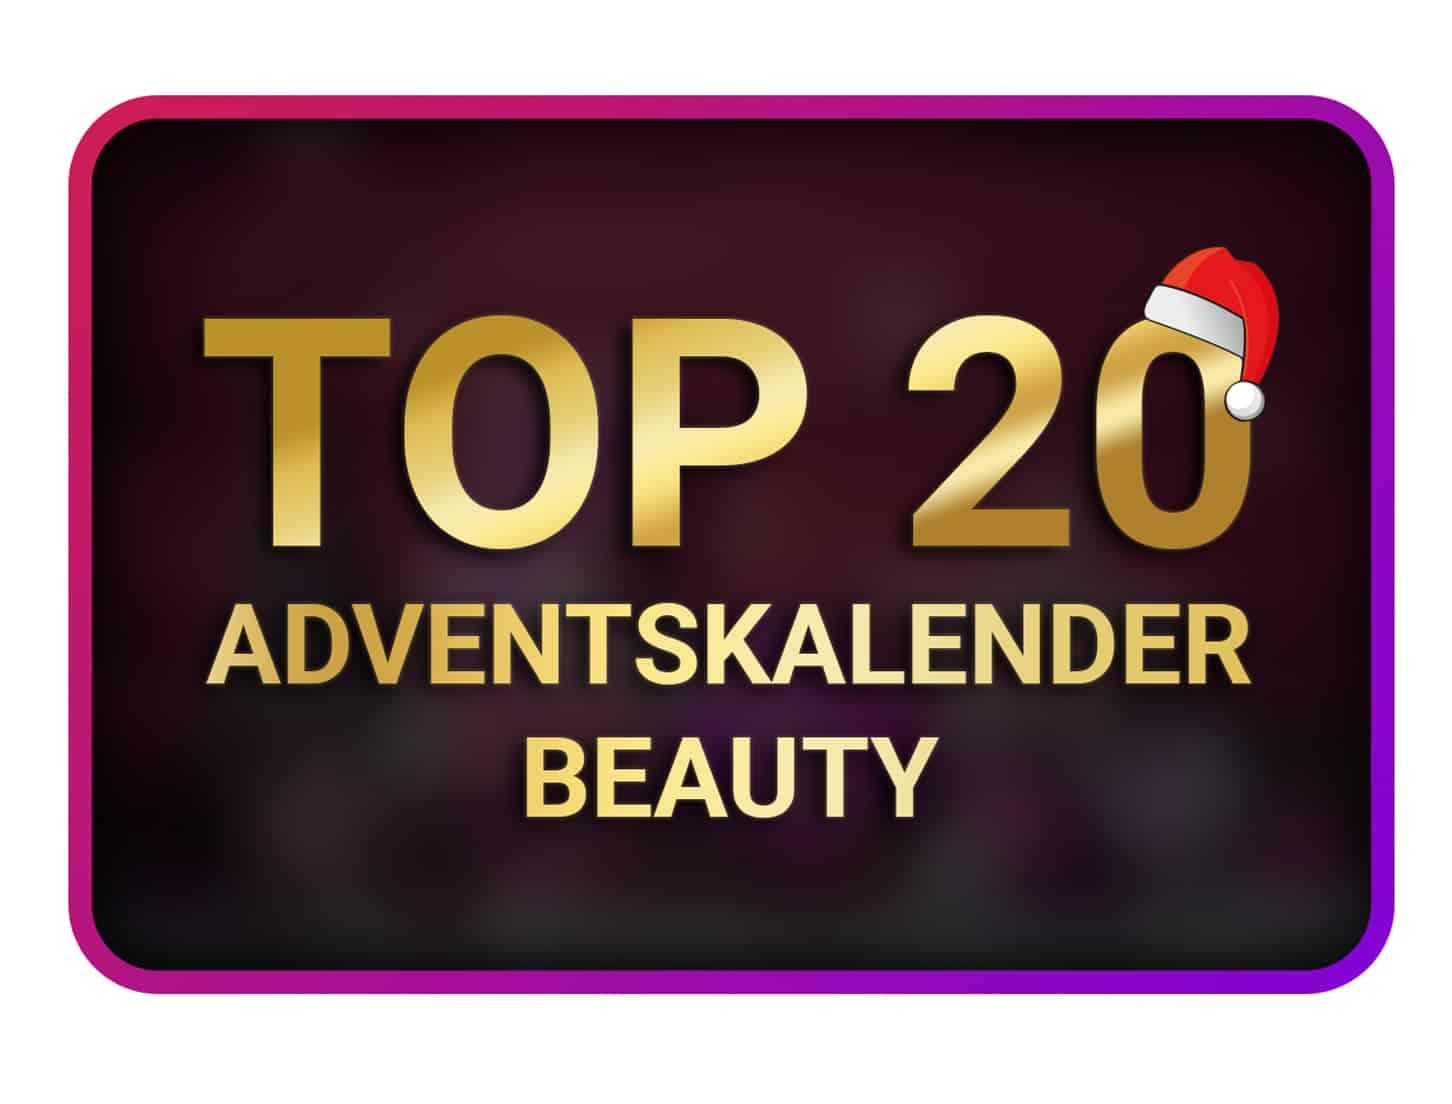 adventskalender-top20-beauty-2021